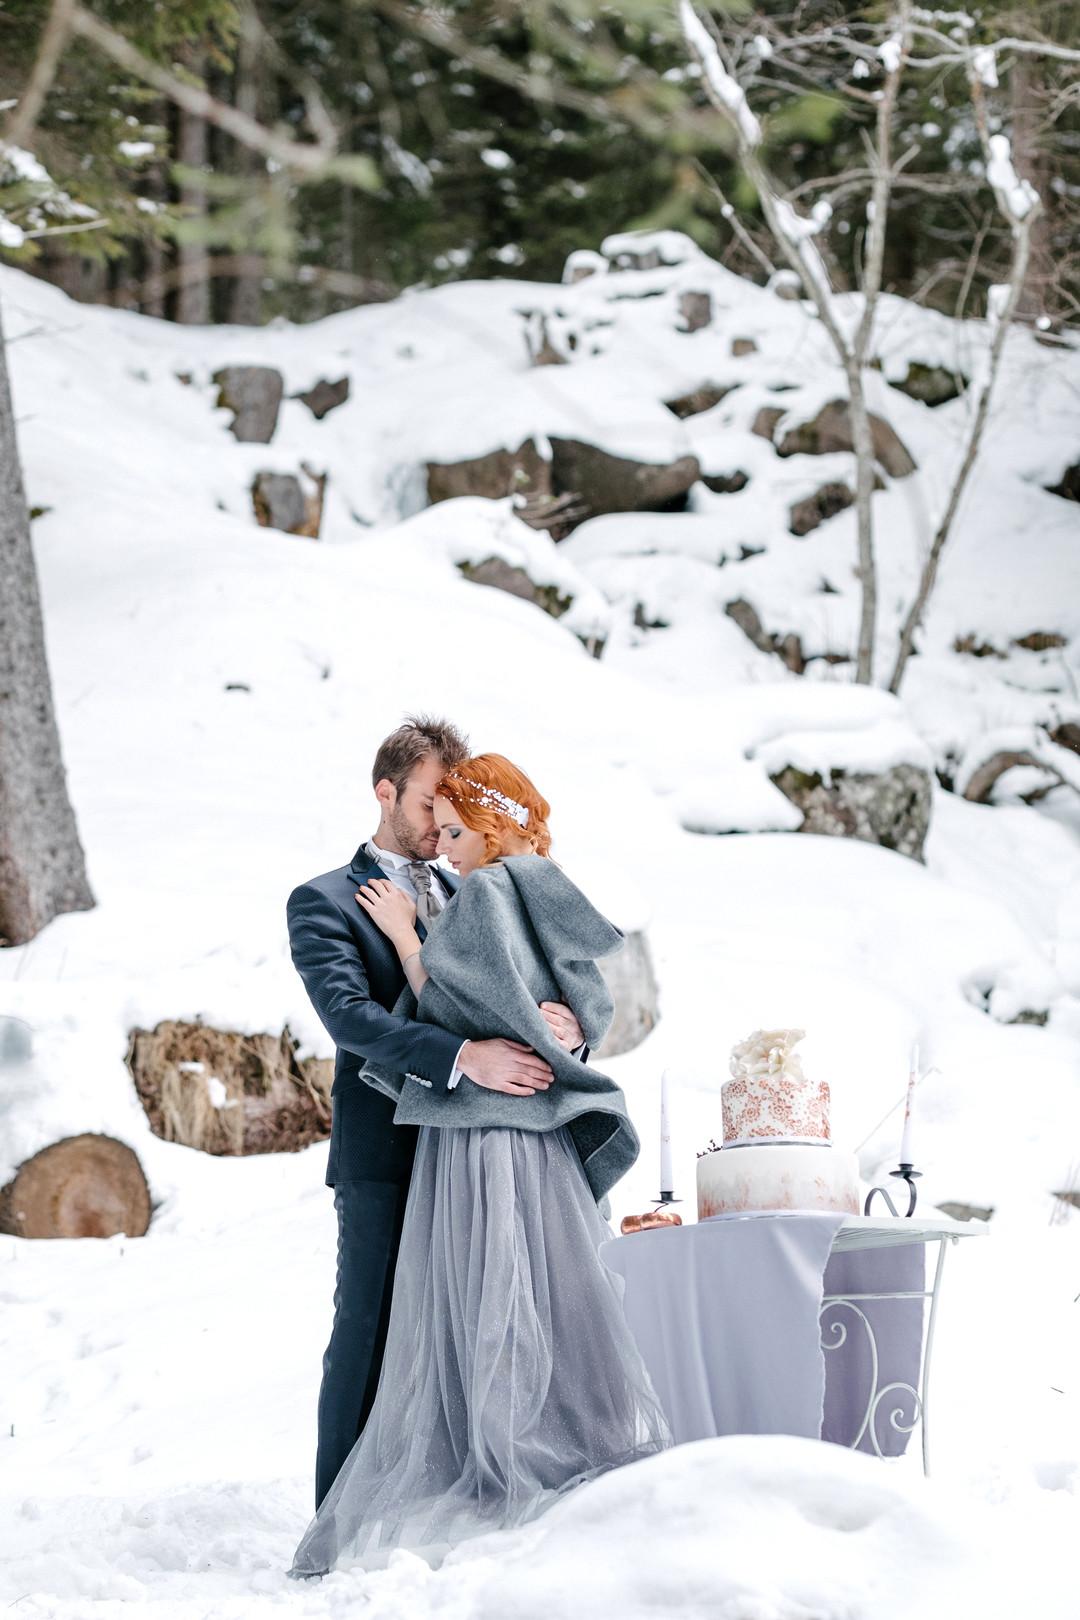 vinterbröllop+natur